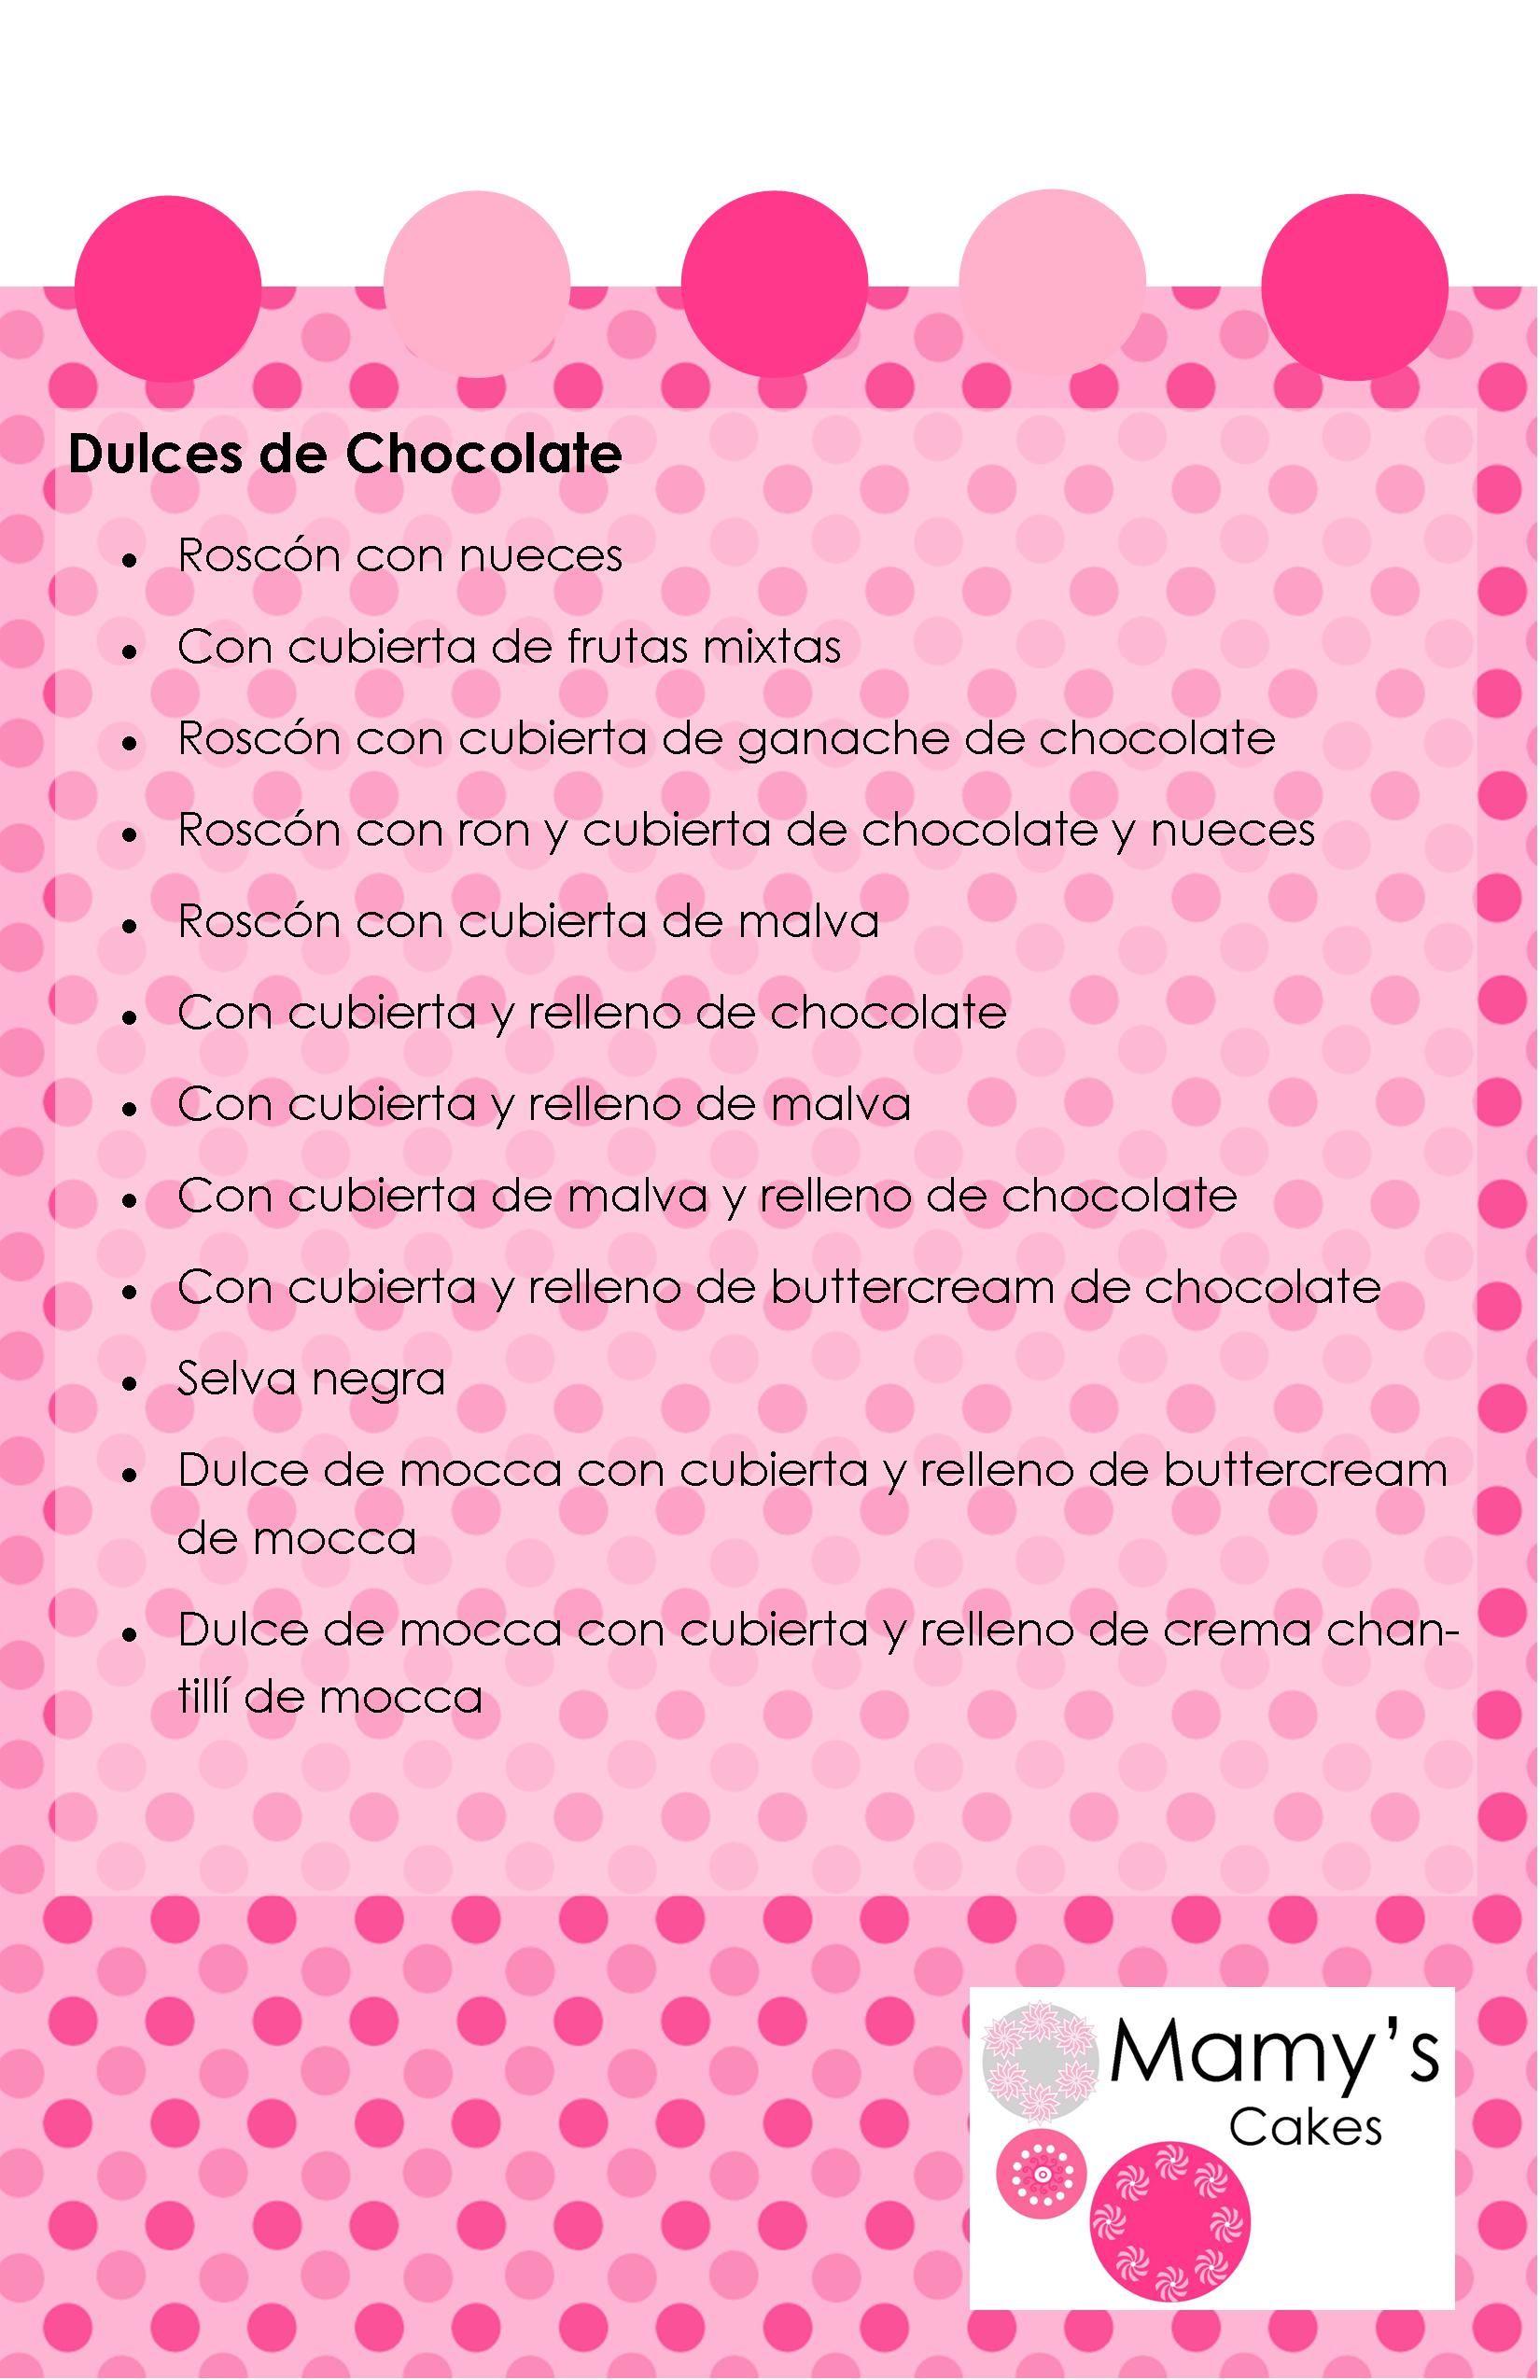 Dulces de Chocolate